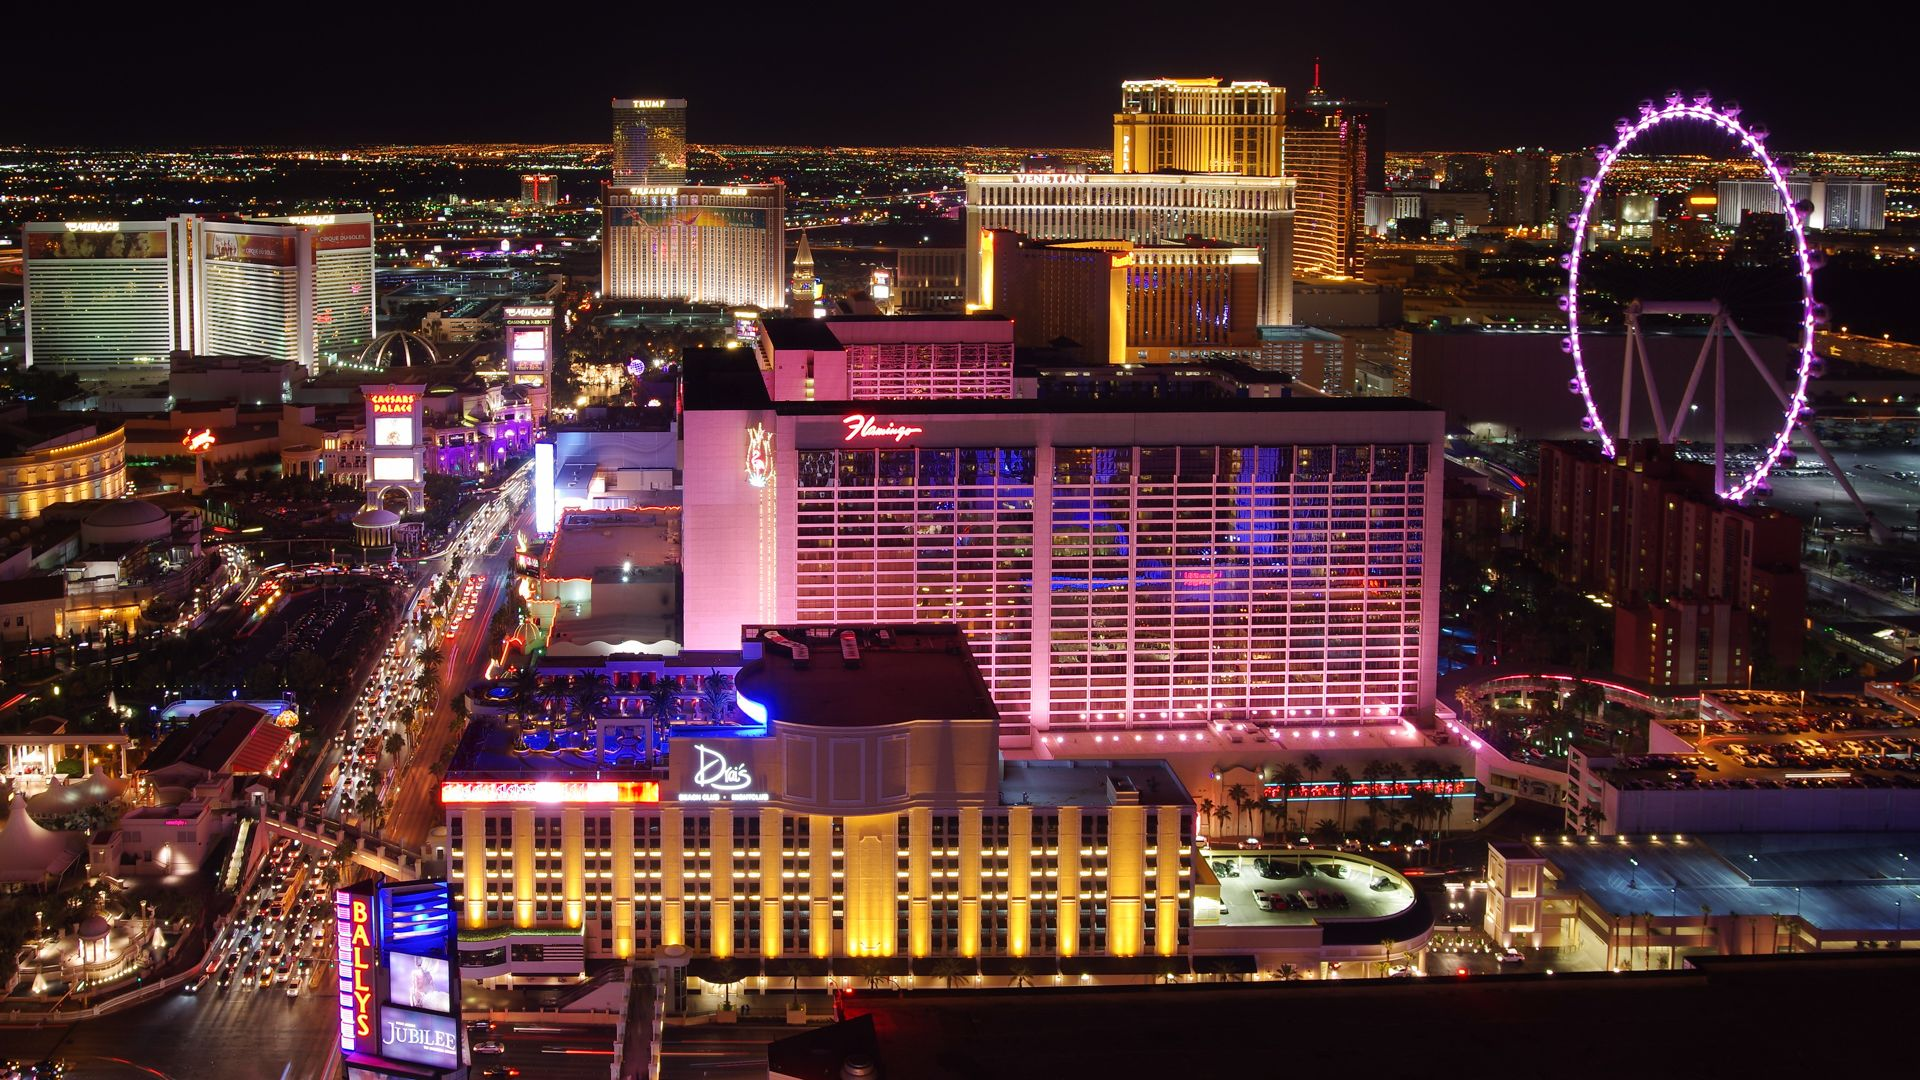 Las Vegas Strip Flamingo Wheel HD Wallpaper 1920x1080 ID47944 1920x1080